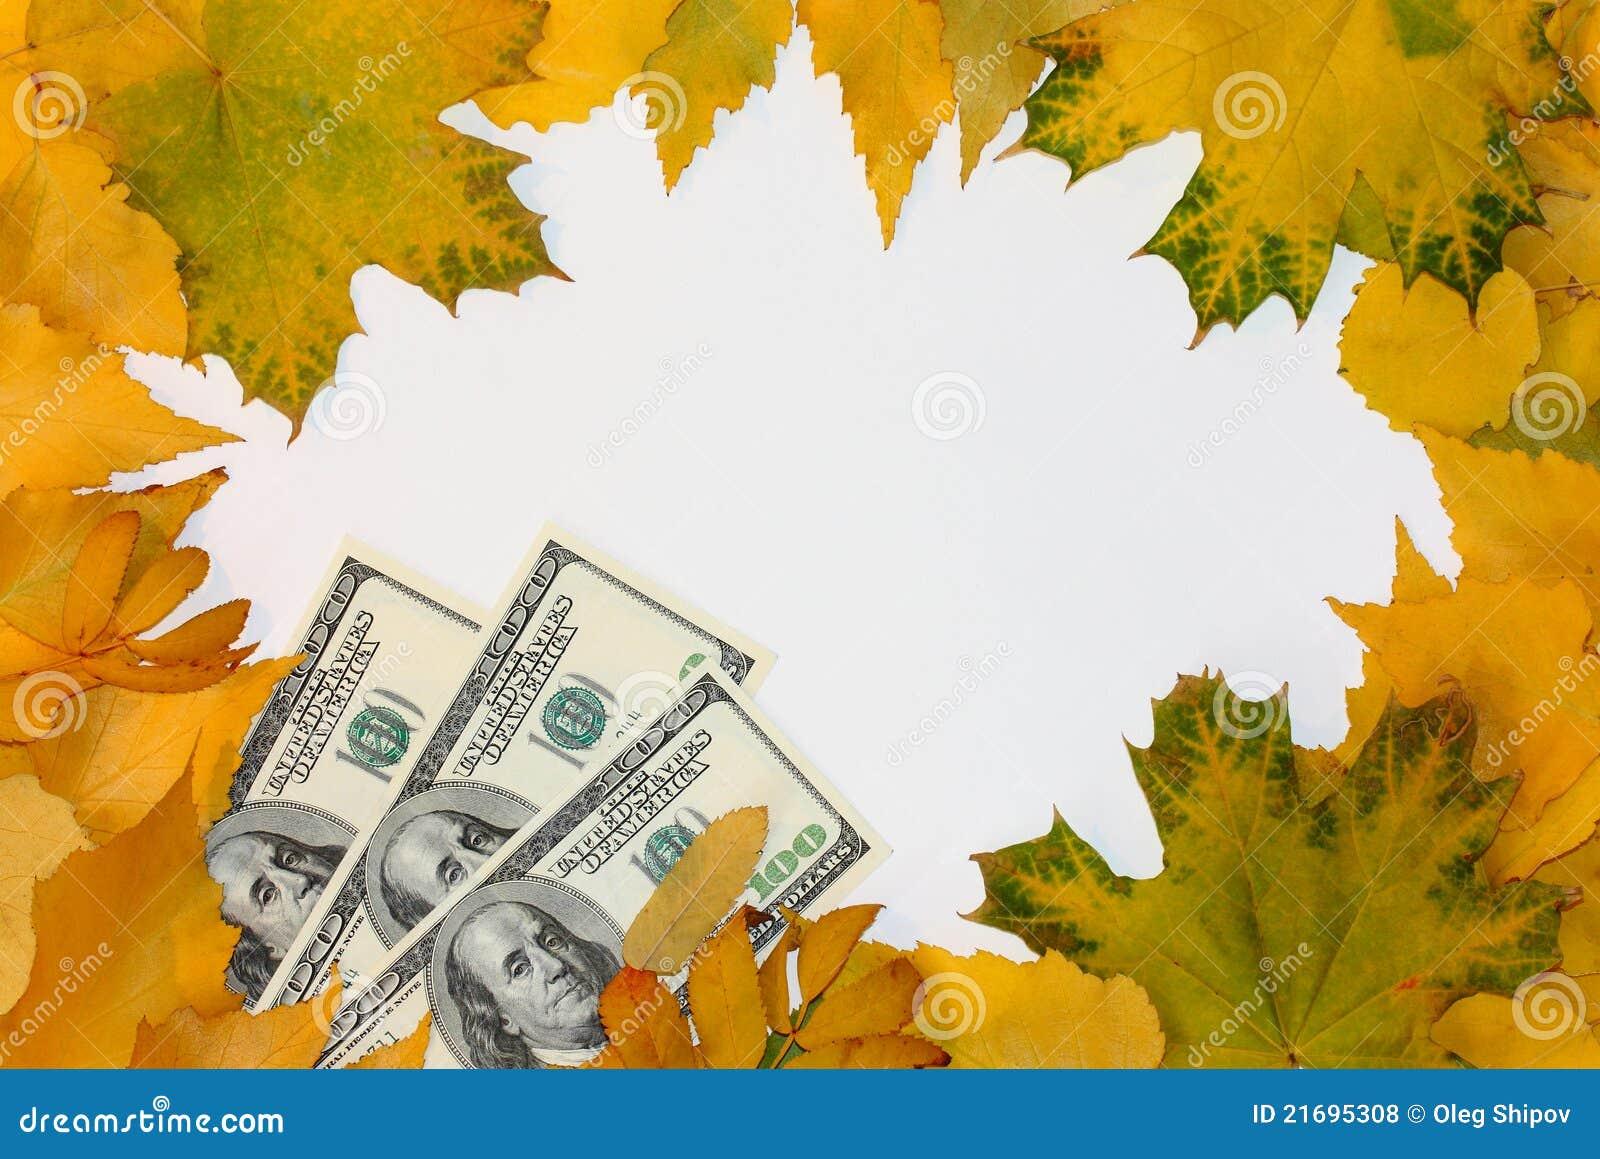 Spadek leafs pieniądze